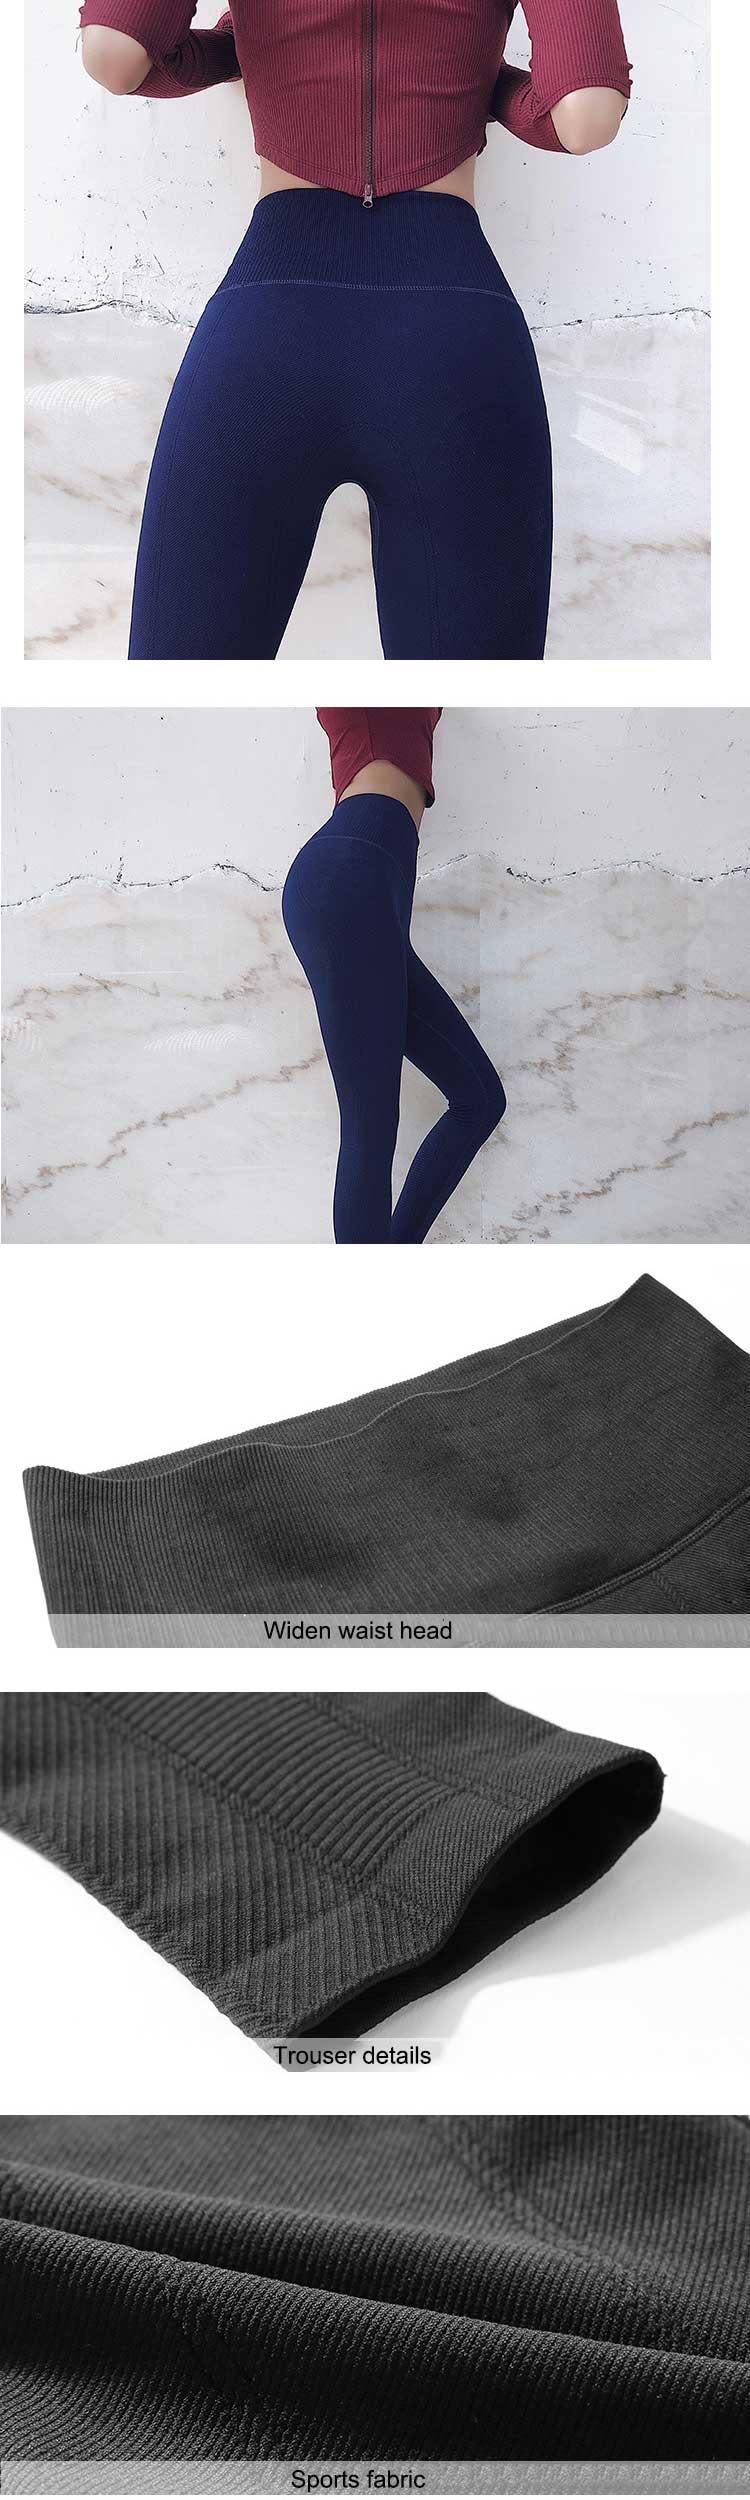 High-waist-beauty-hip-line-design,-decorate-the-waist-side-over-flesh